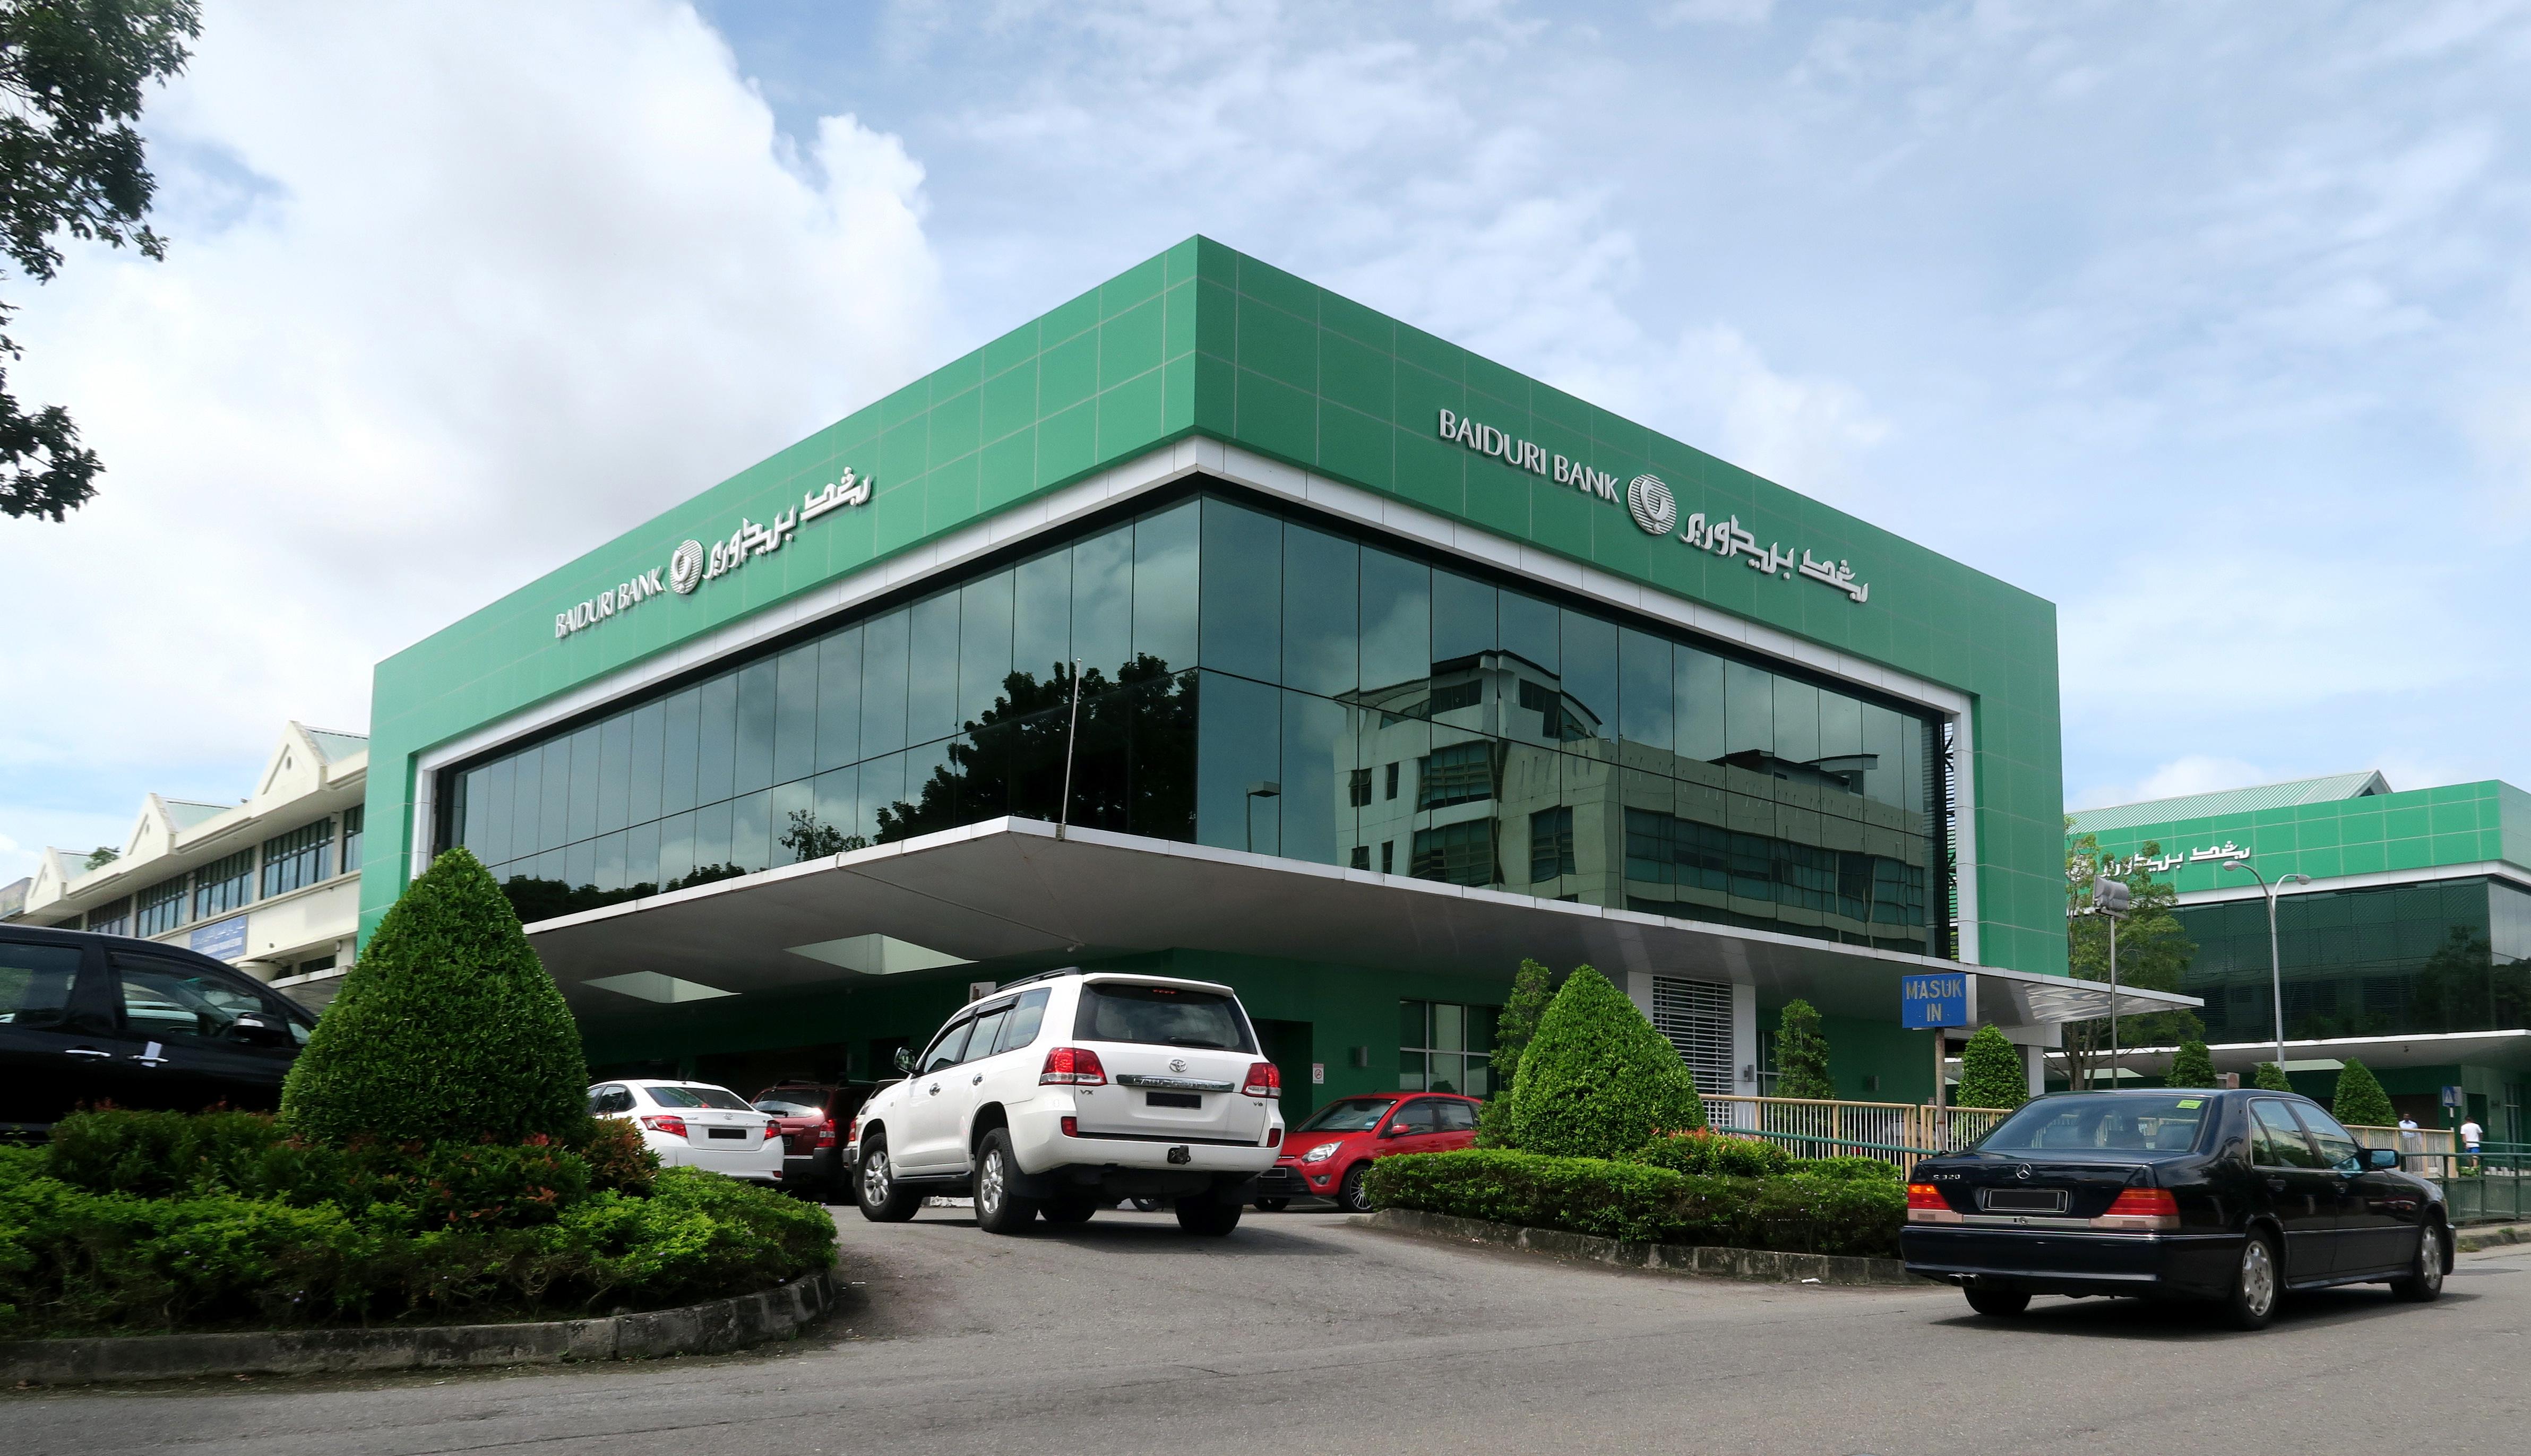 Baiduri Bank, Brunei | Wikimedia